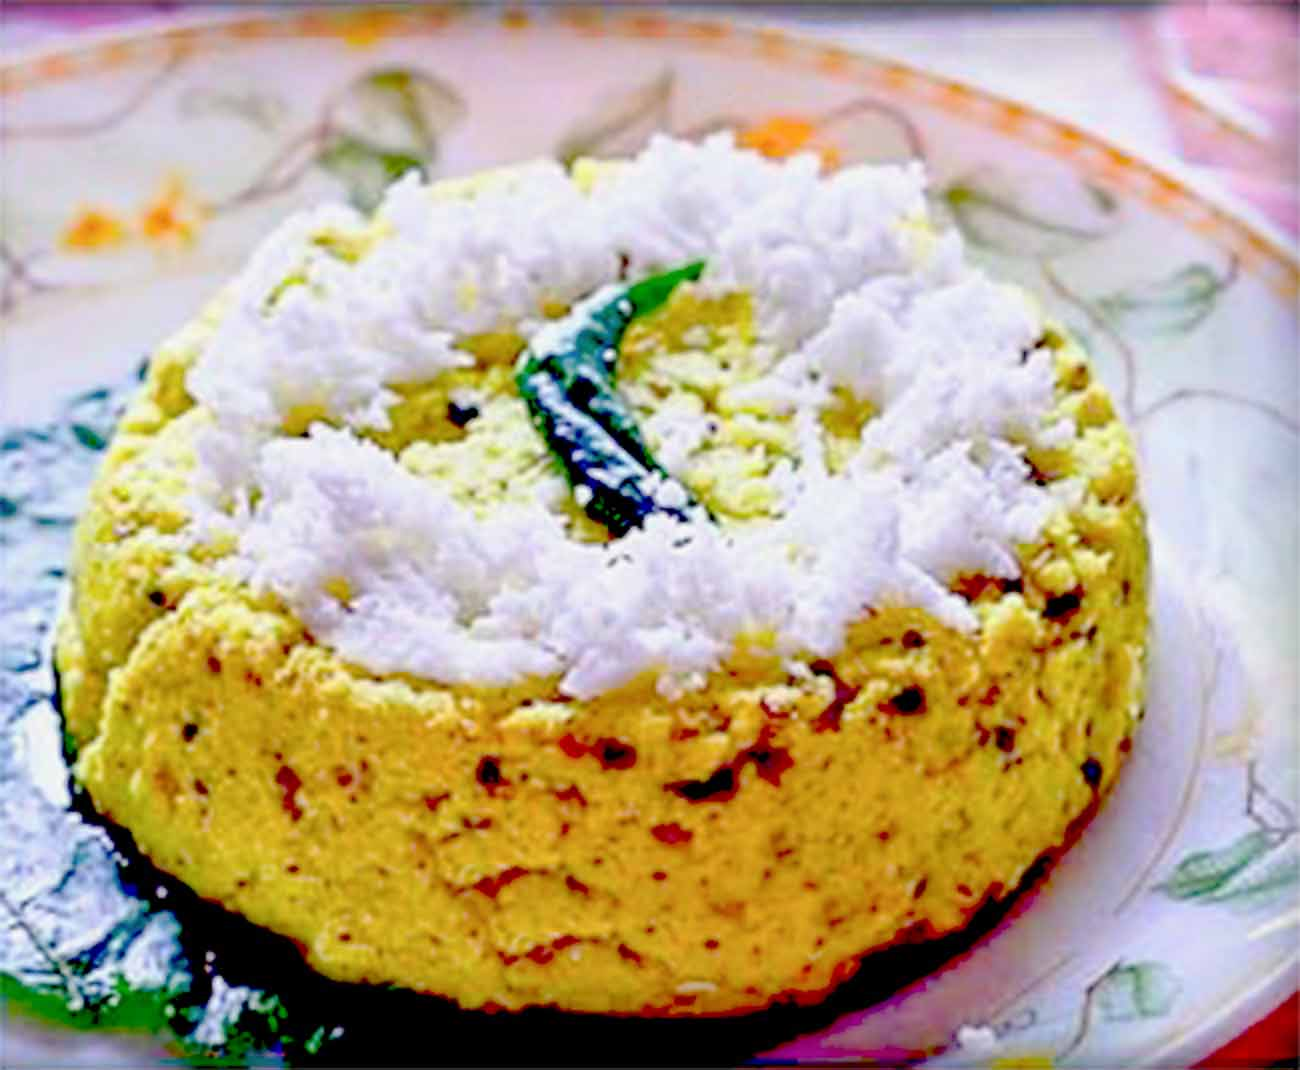 chanar paturi recipe in hindi by archanas chanar paturi recipe in hindi forumfinder Choice Image